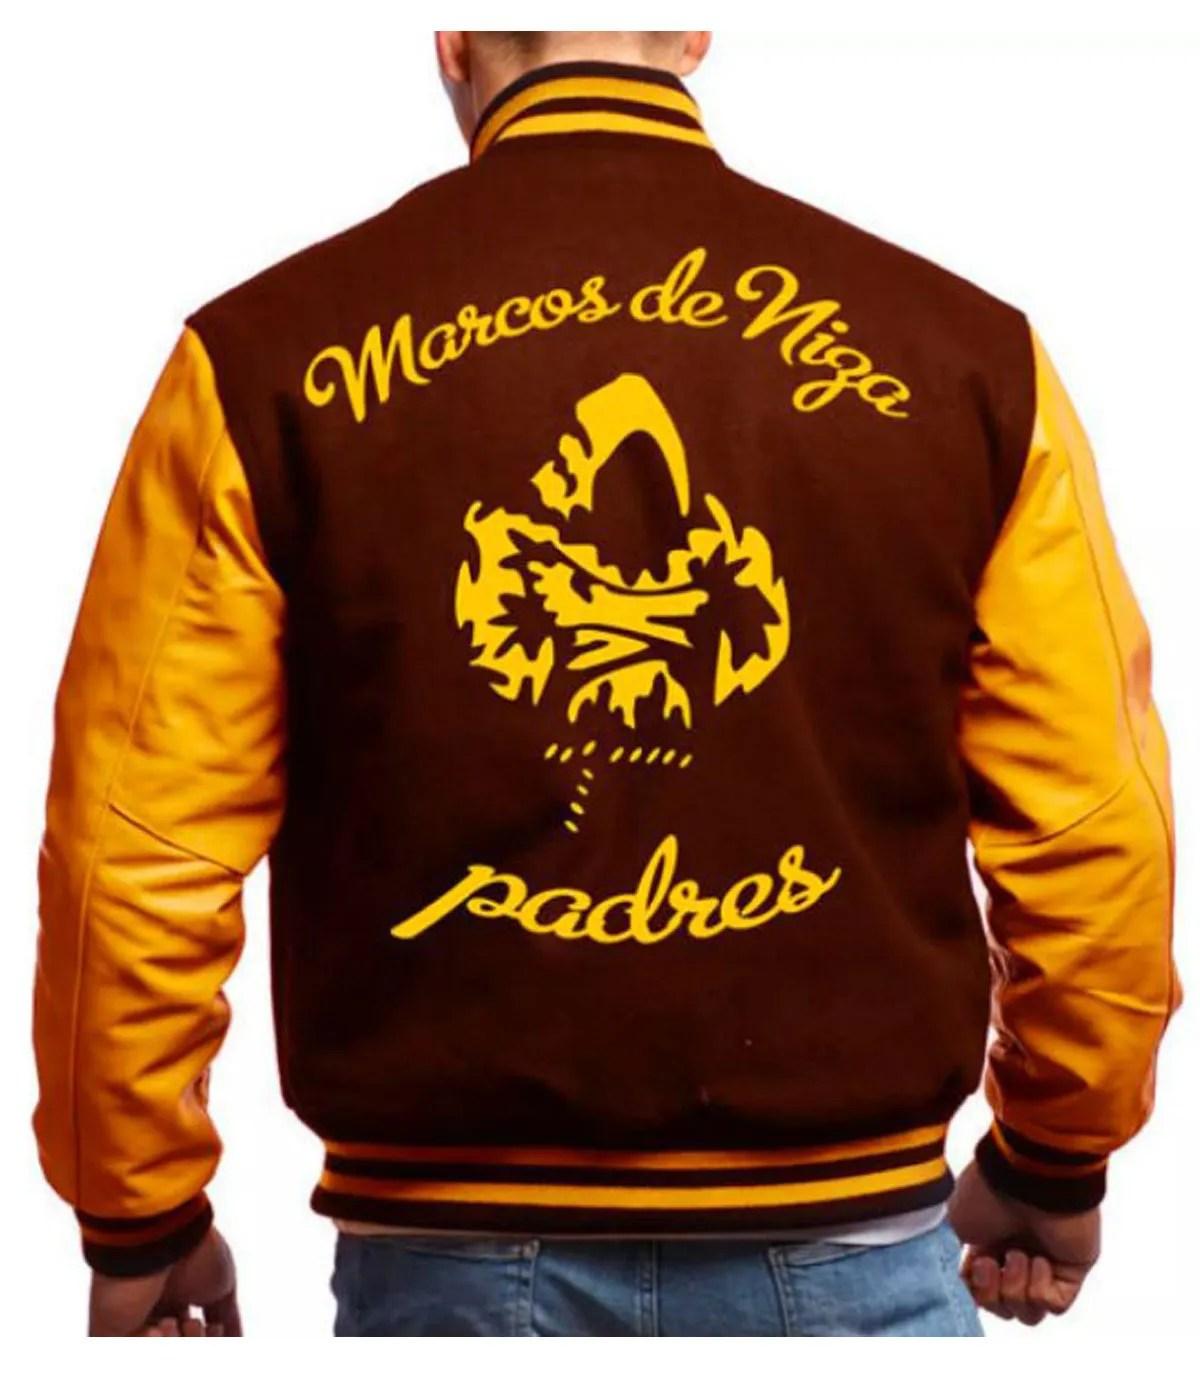 marcos-de-niza-high-school-varsity-jacket